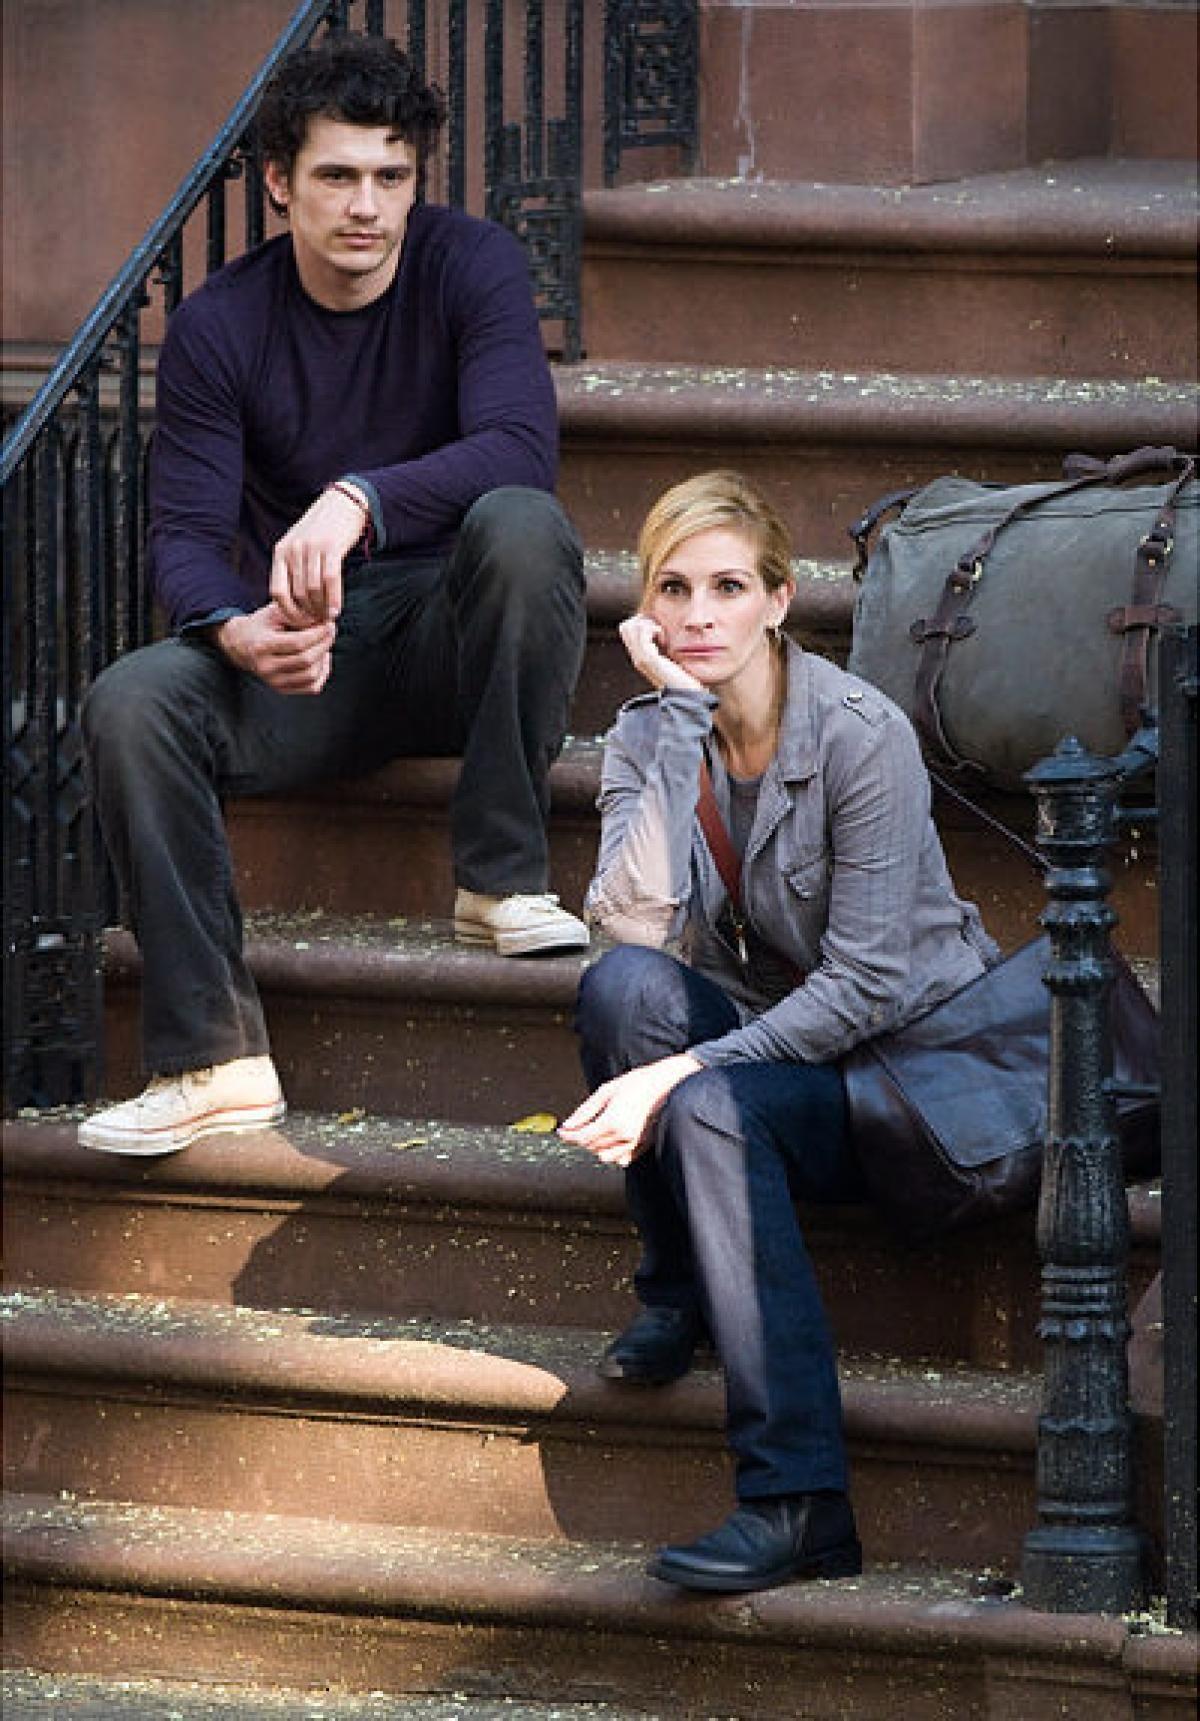 James Franco And Julia Roberts Comer Rezar Amar Pelicula Elizabeth Gilbert Comer Rezar Amar